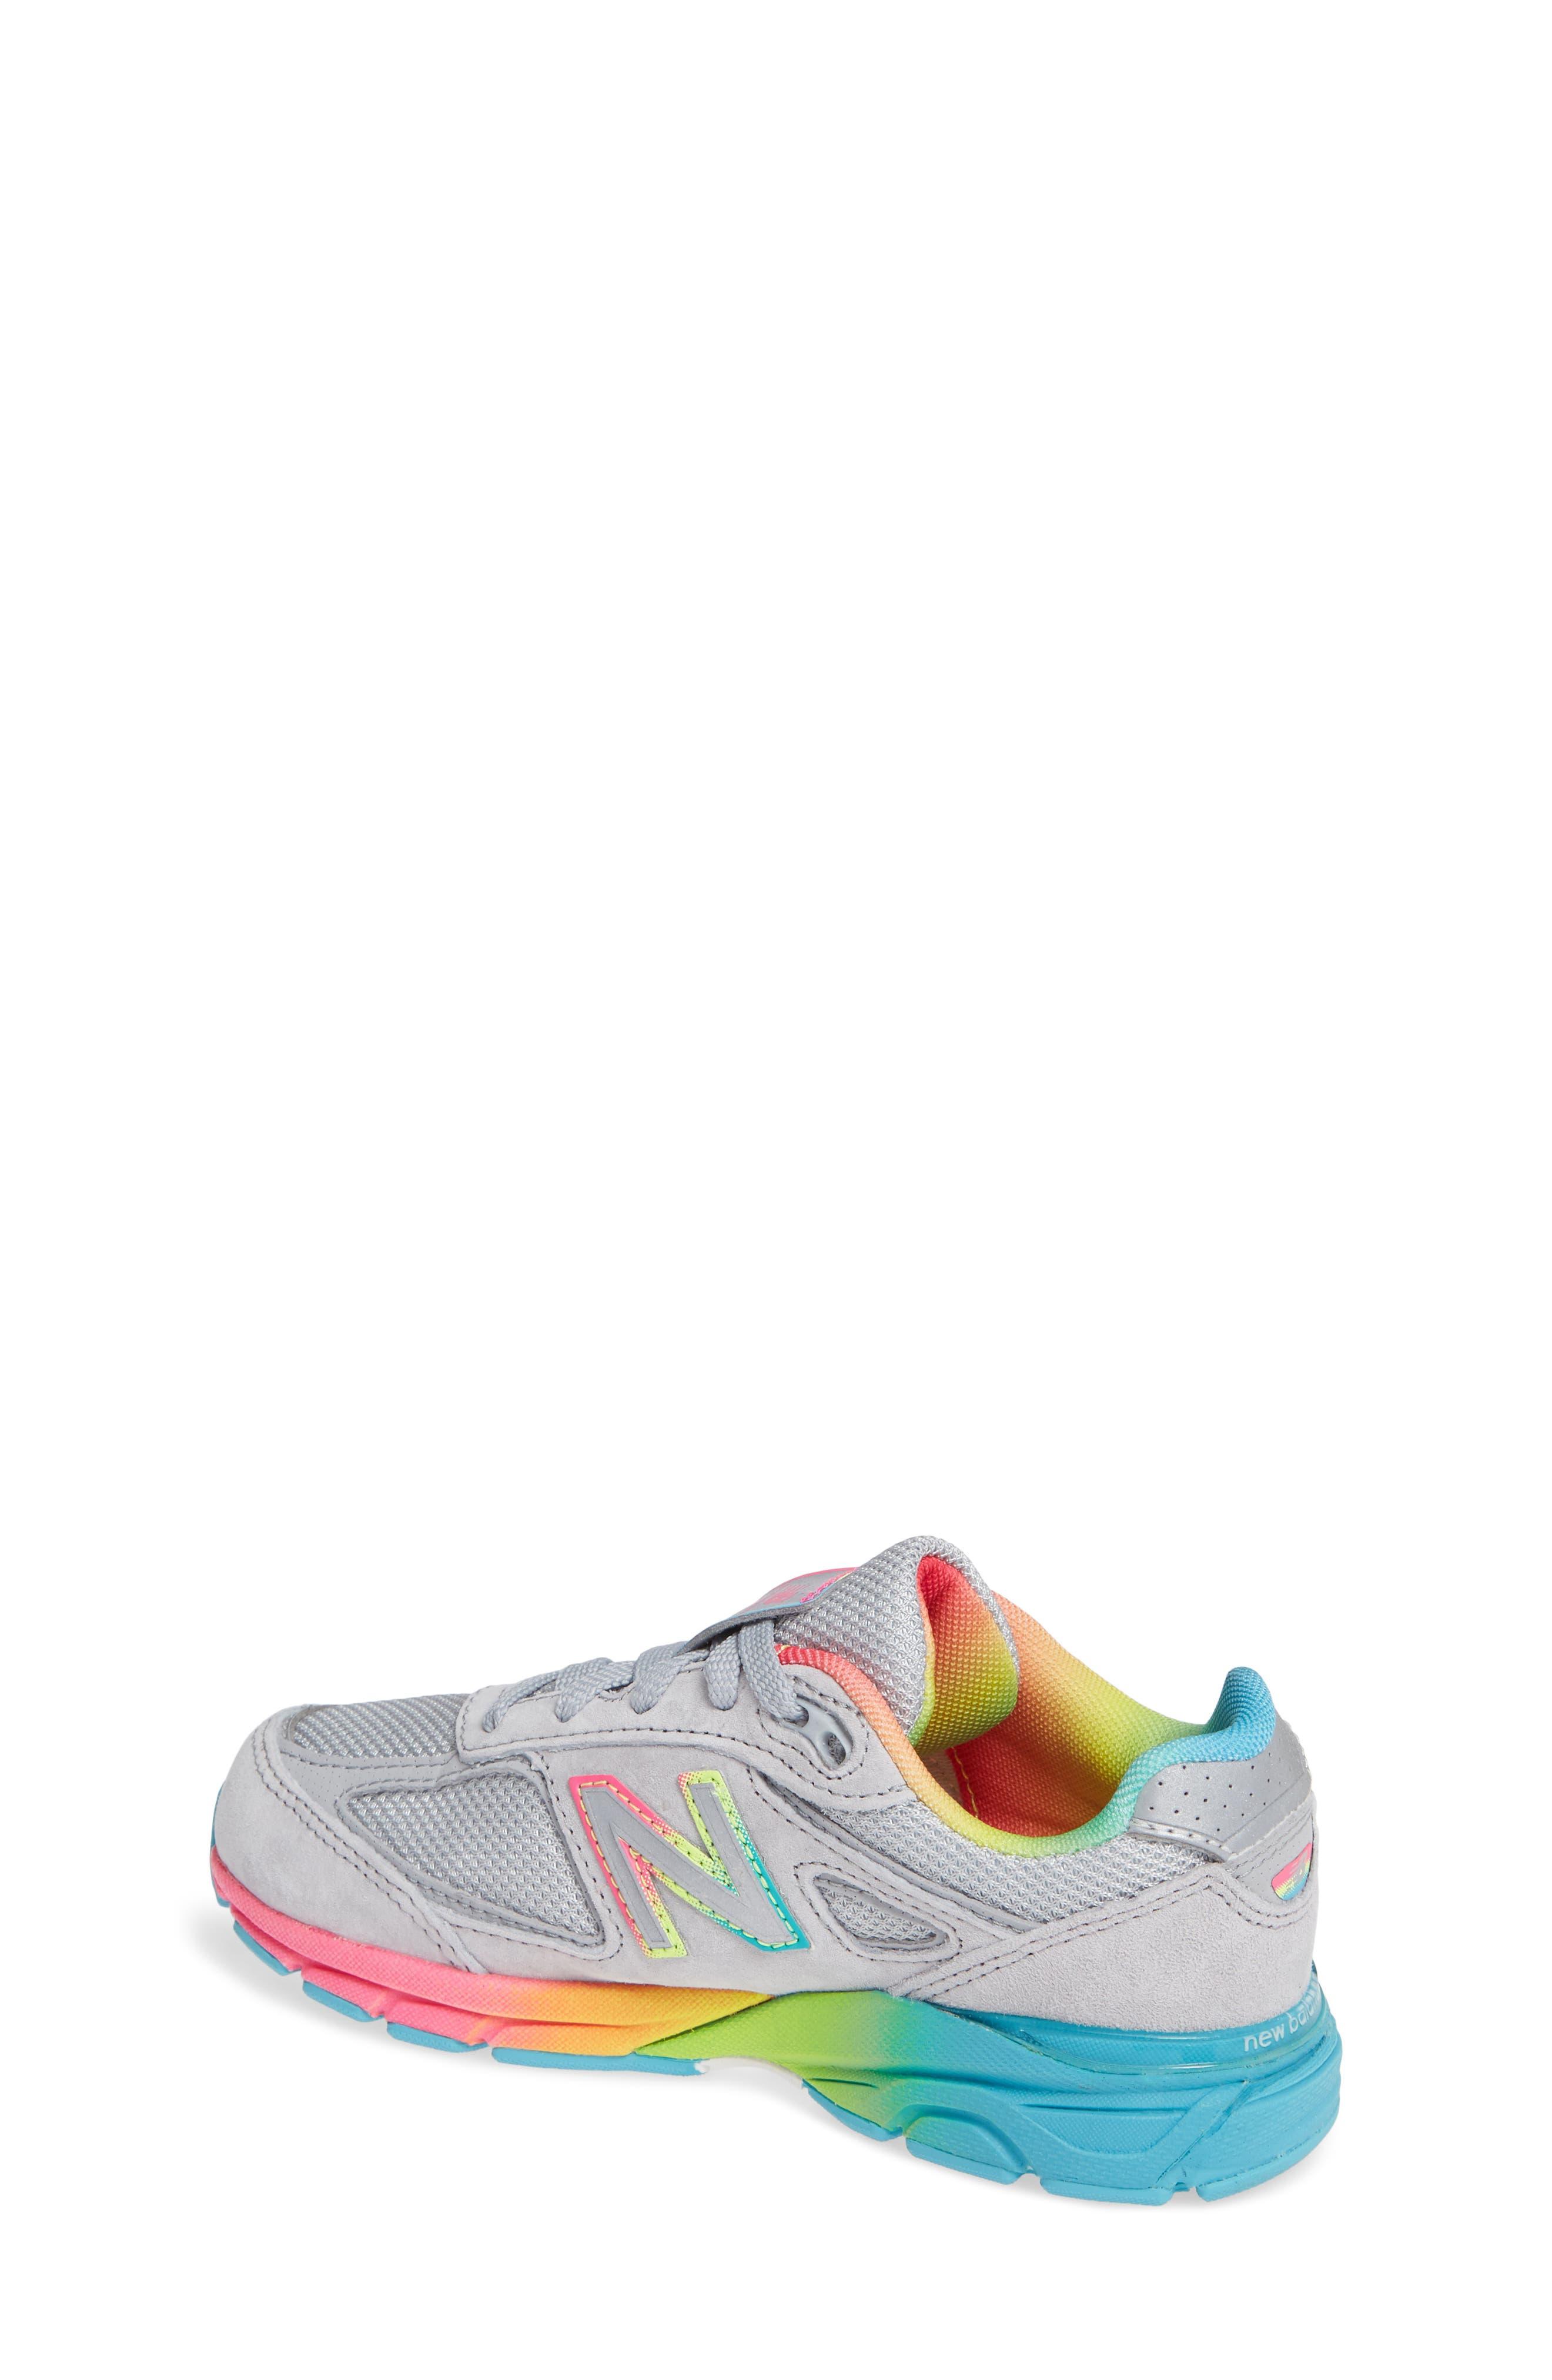 990v4 Sneaker,                             Alternate thumbnail 2, color,                             ATHLETIC GREY/ MULTI